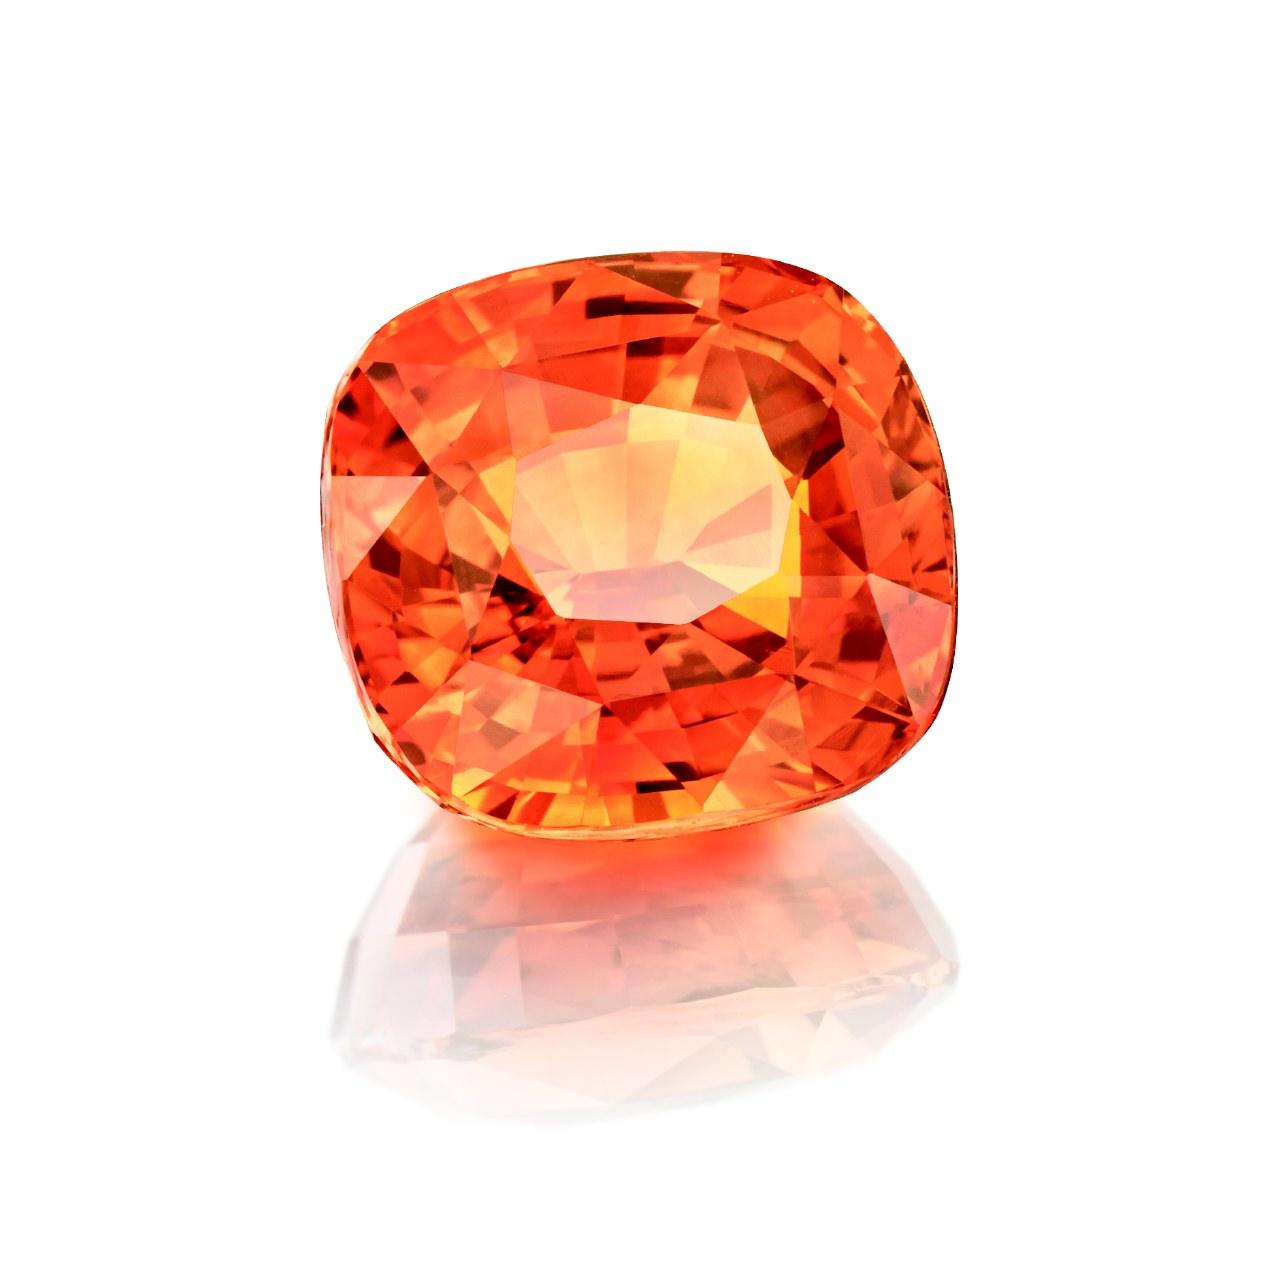 05. Constantin Wild - Sapphire orange, antique cushion PRINT-cmyk